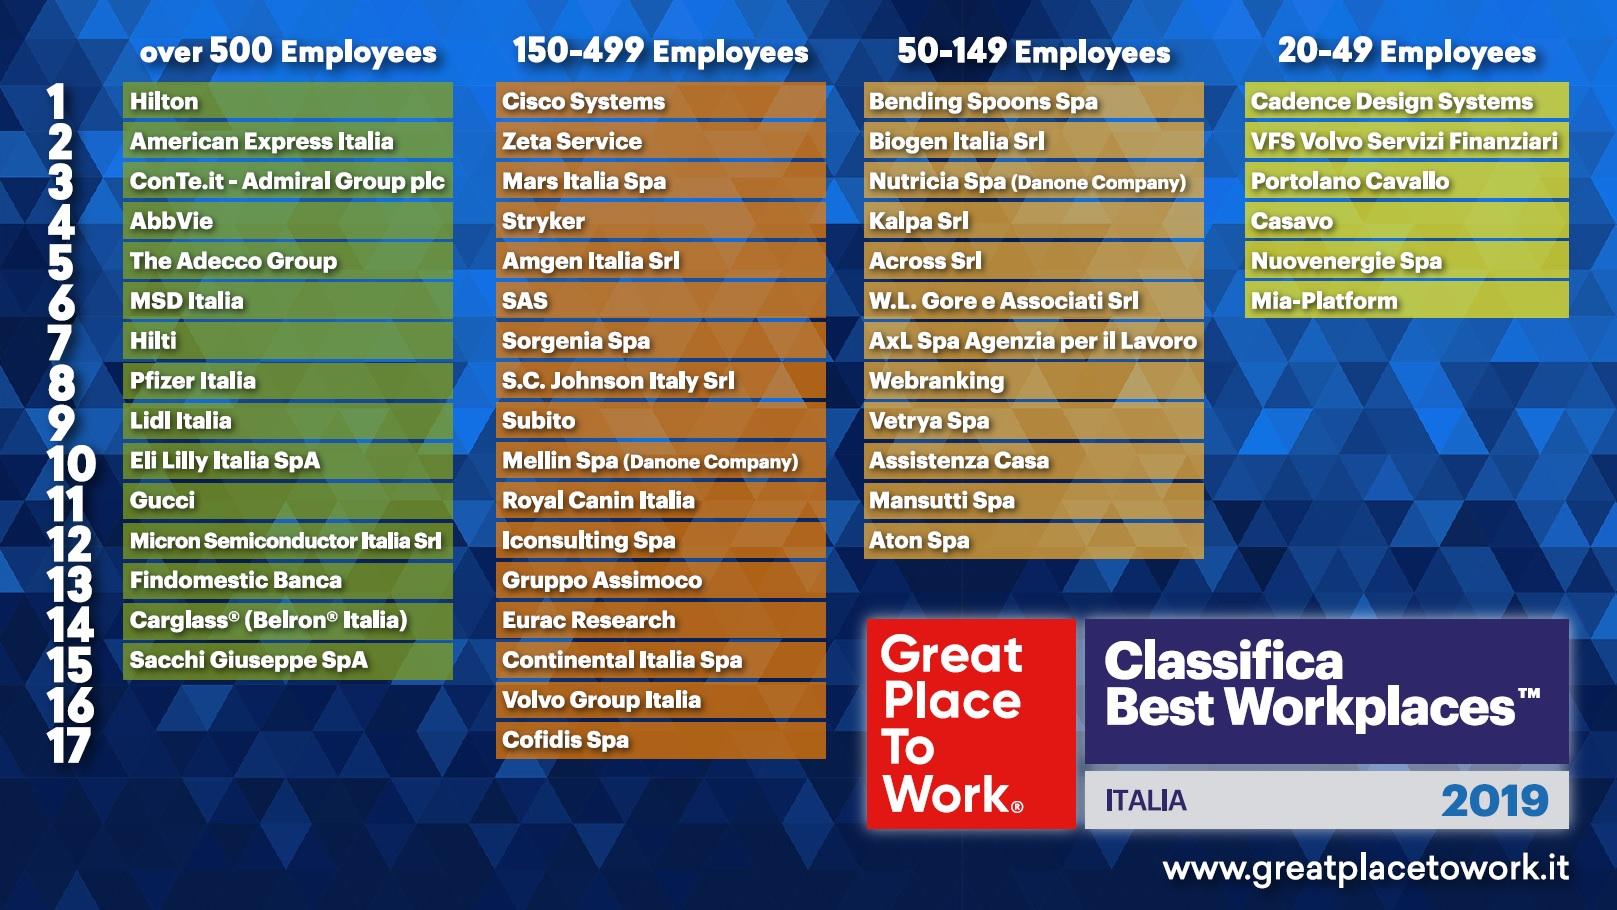 Classifica Best Workplaces Italia 2019